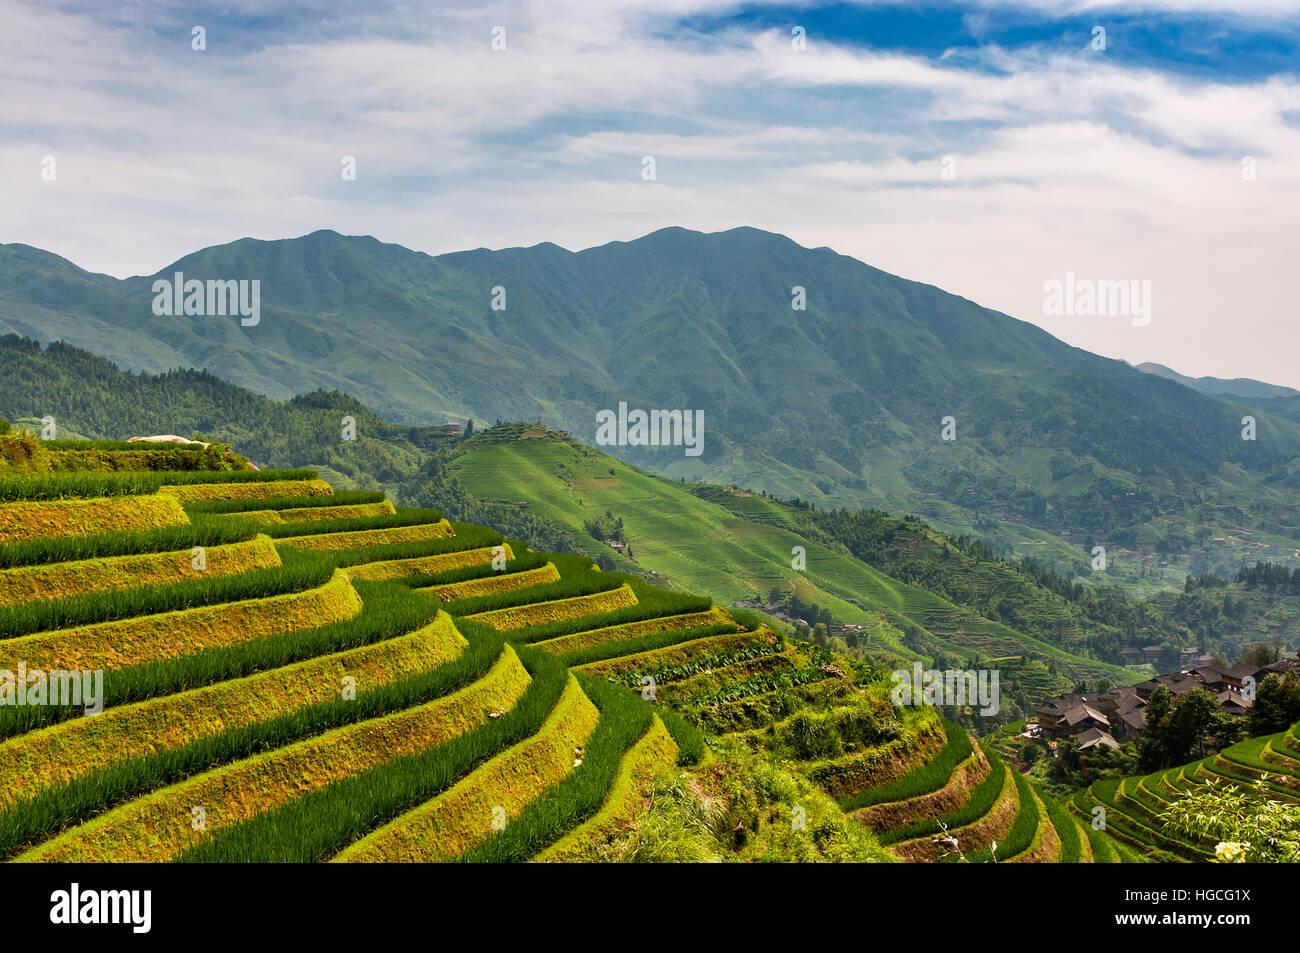 View of the Longsheng Rice Terraces (Dragon's Backbone Rice Terraces) in Guangxi, China. - Stock Image